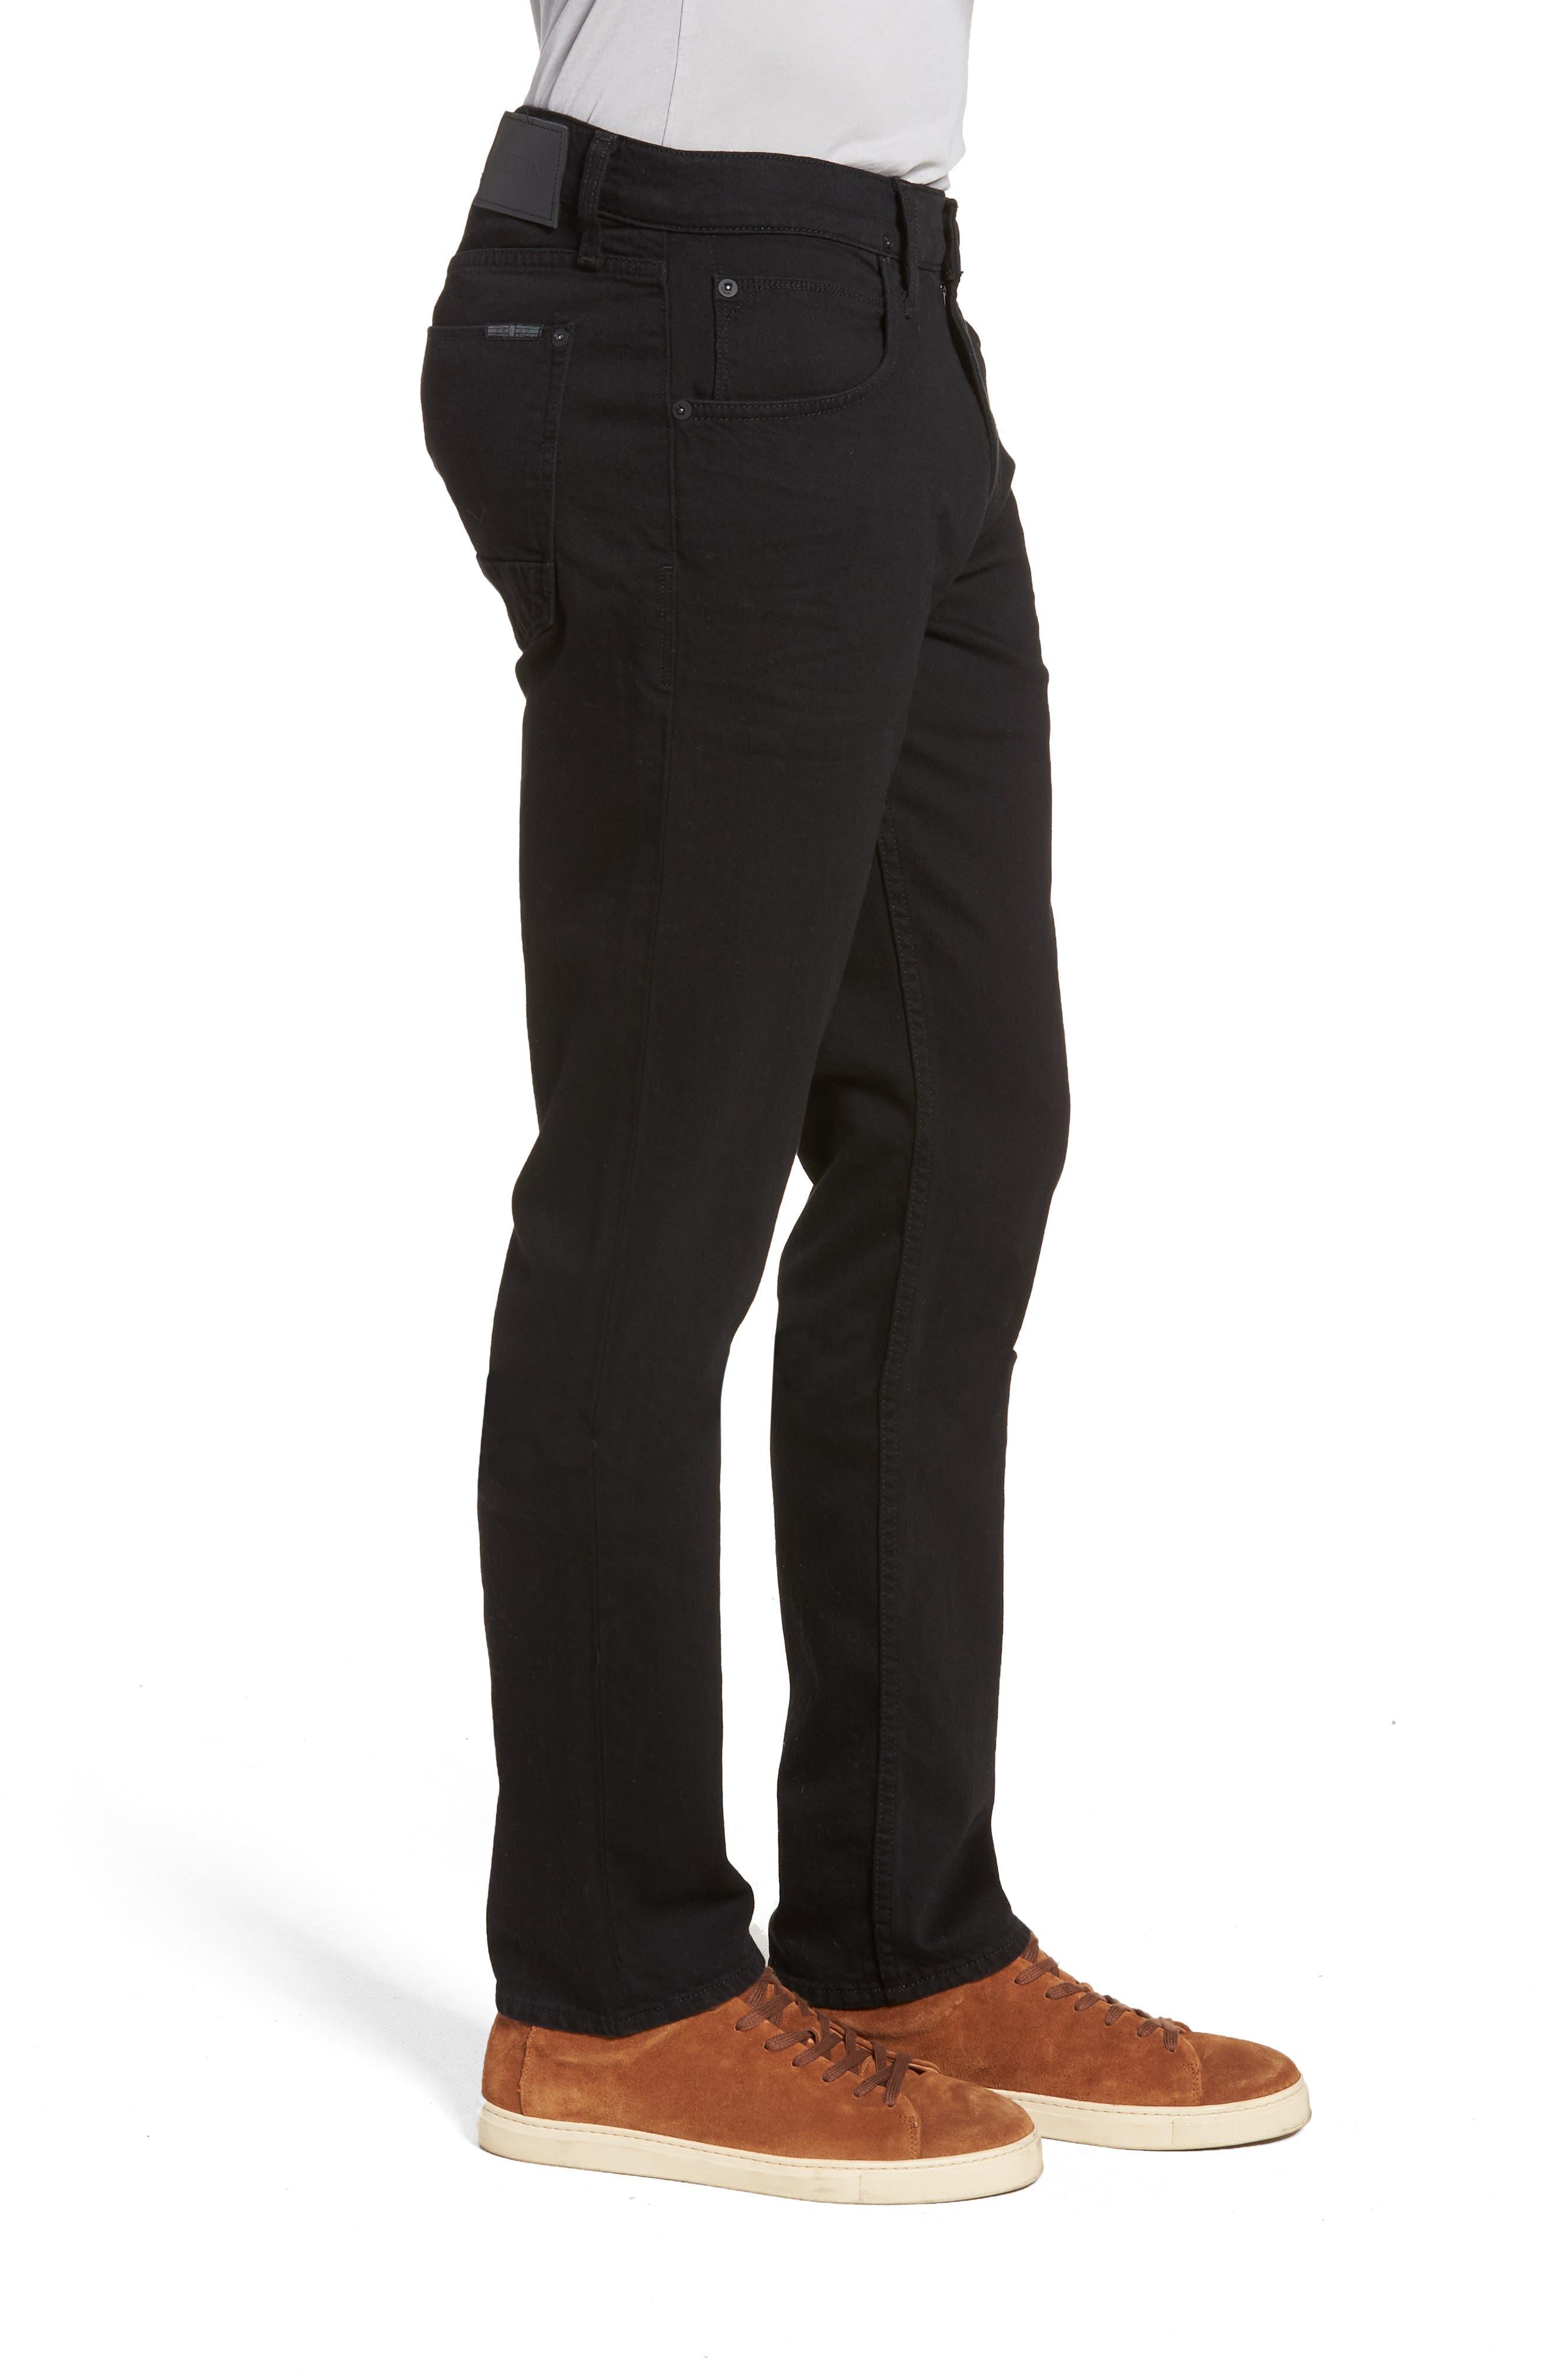 Blake Slim Fit Jeans,                             Alternate thumbnail 3, color,                             Heron